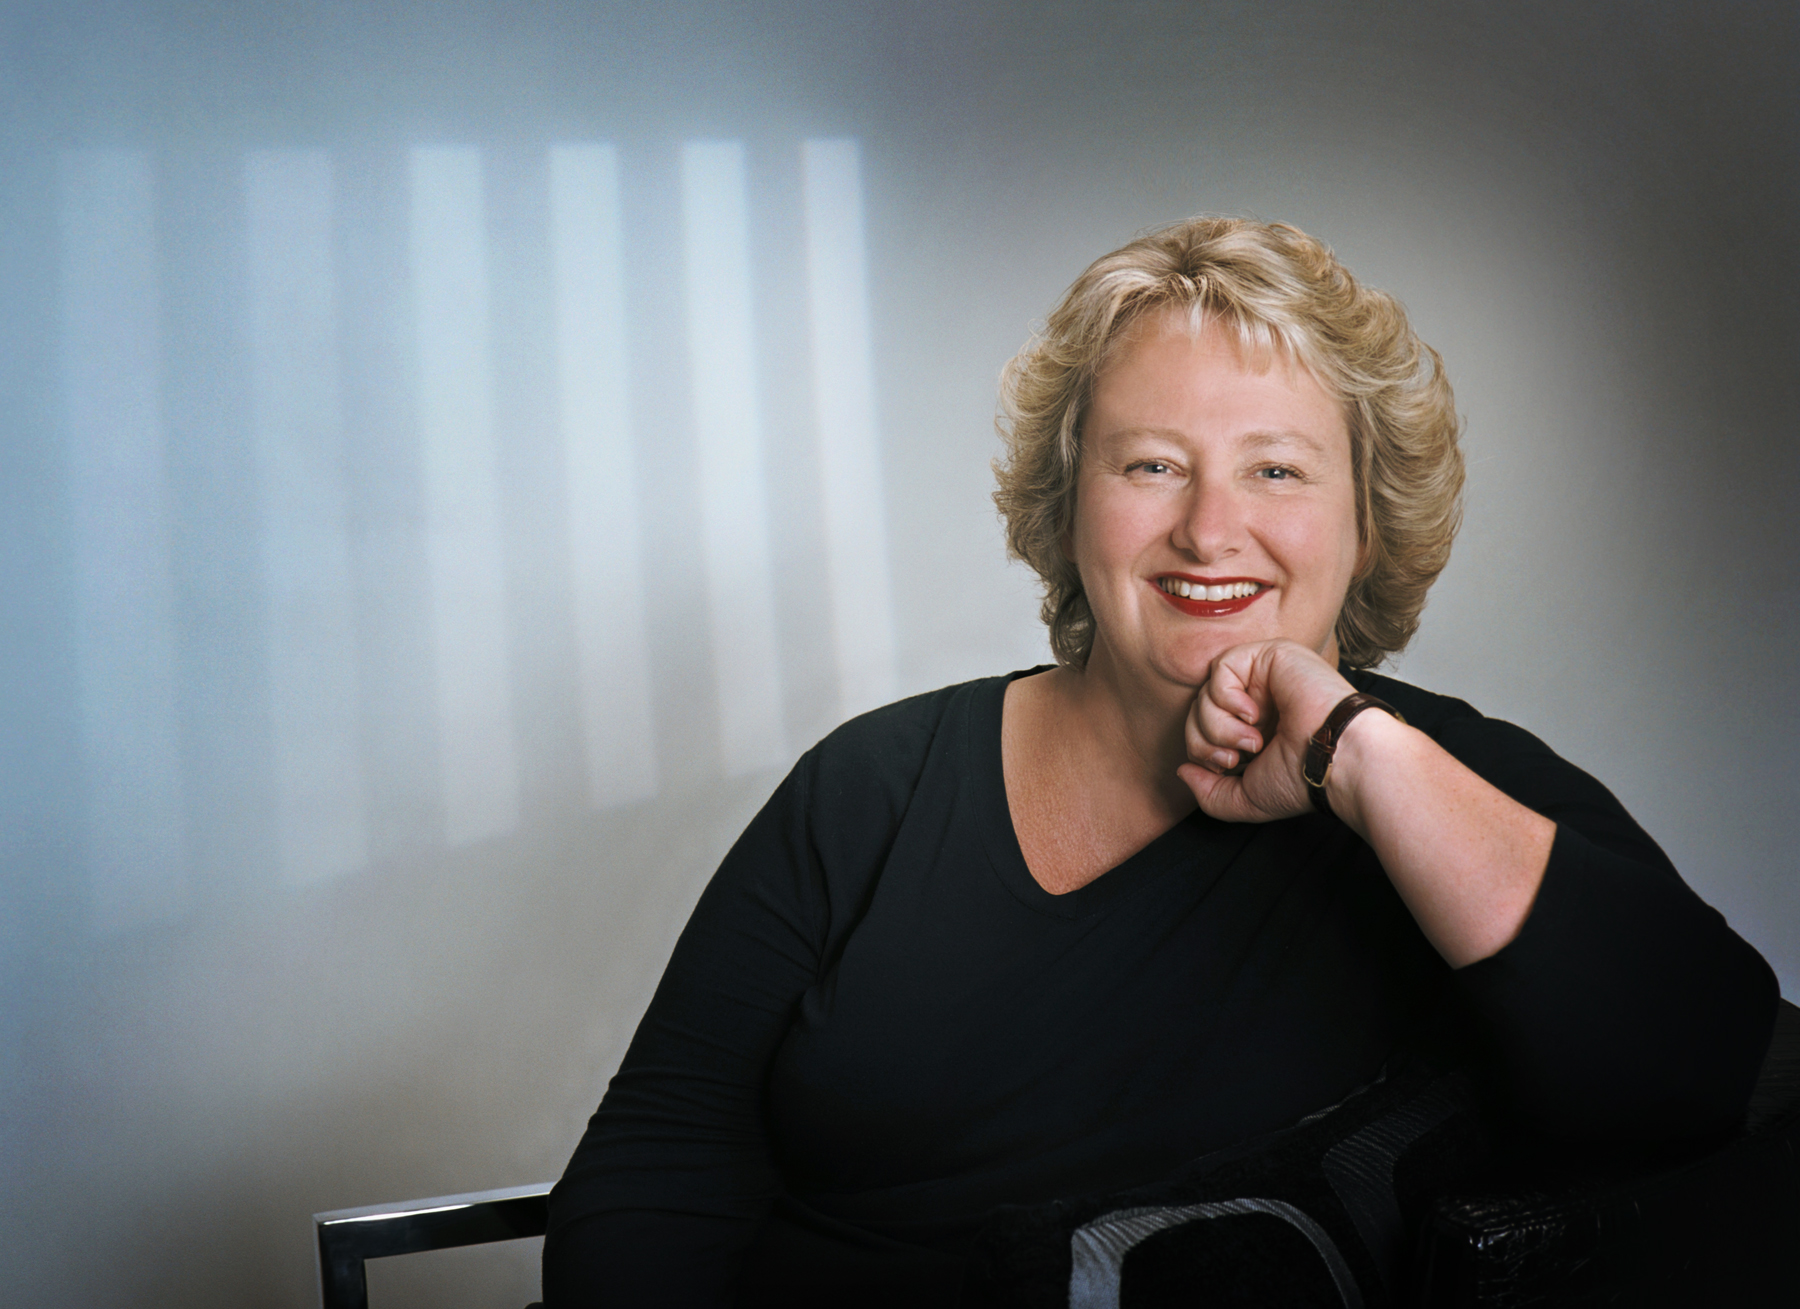 841a39a4b6 Australian Romance Author Showcase with...Anna Campbell - The Booktopian